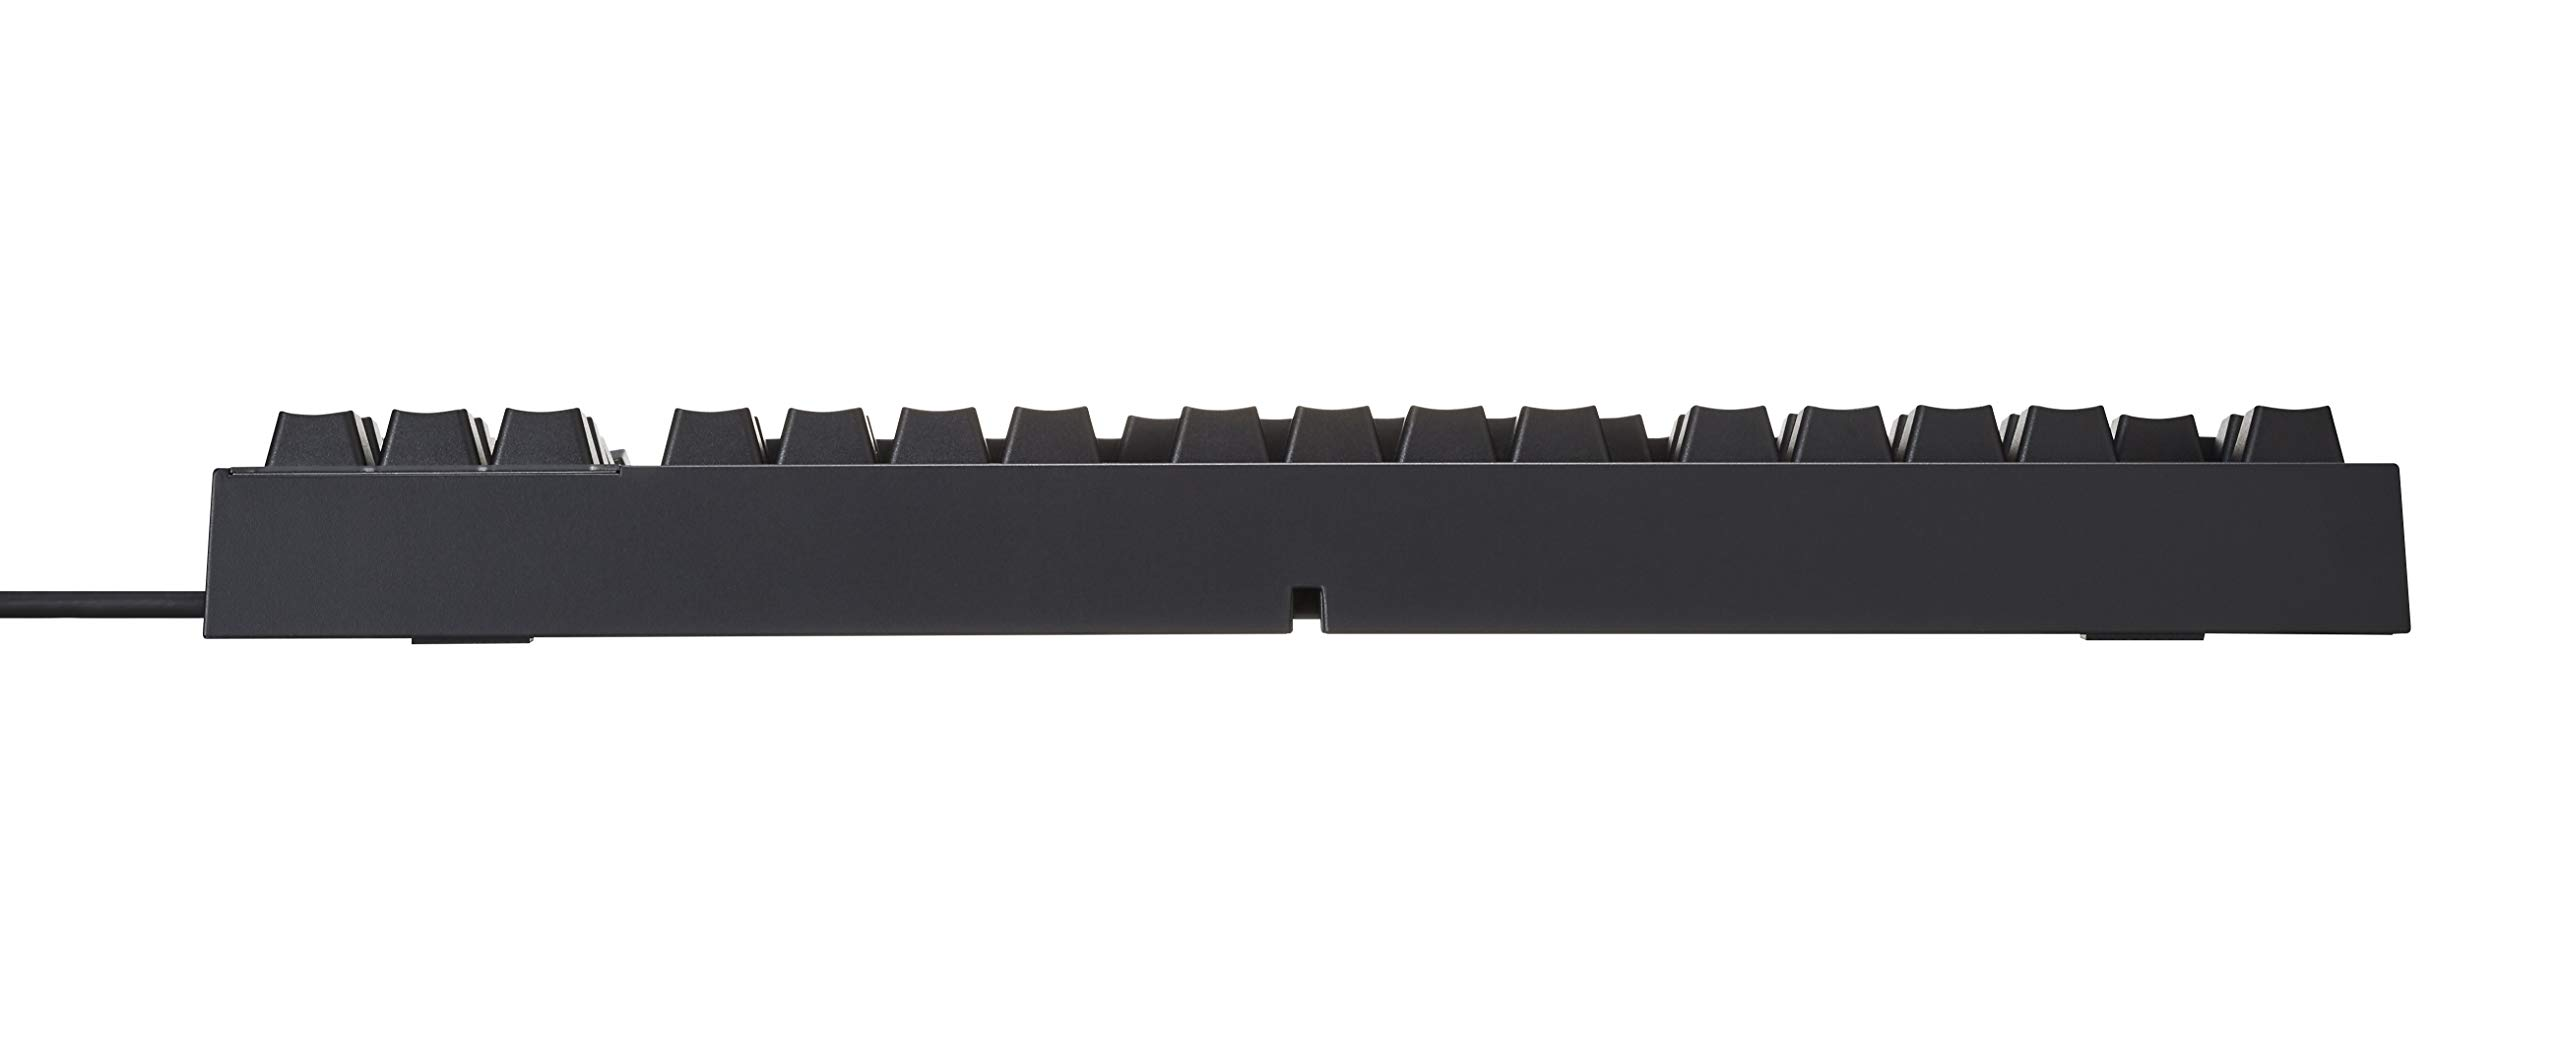 REALFORCE R2 PFU Limited Edition Keyboard (Mid, Black, 45G) by Fujitsu (Image #5)